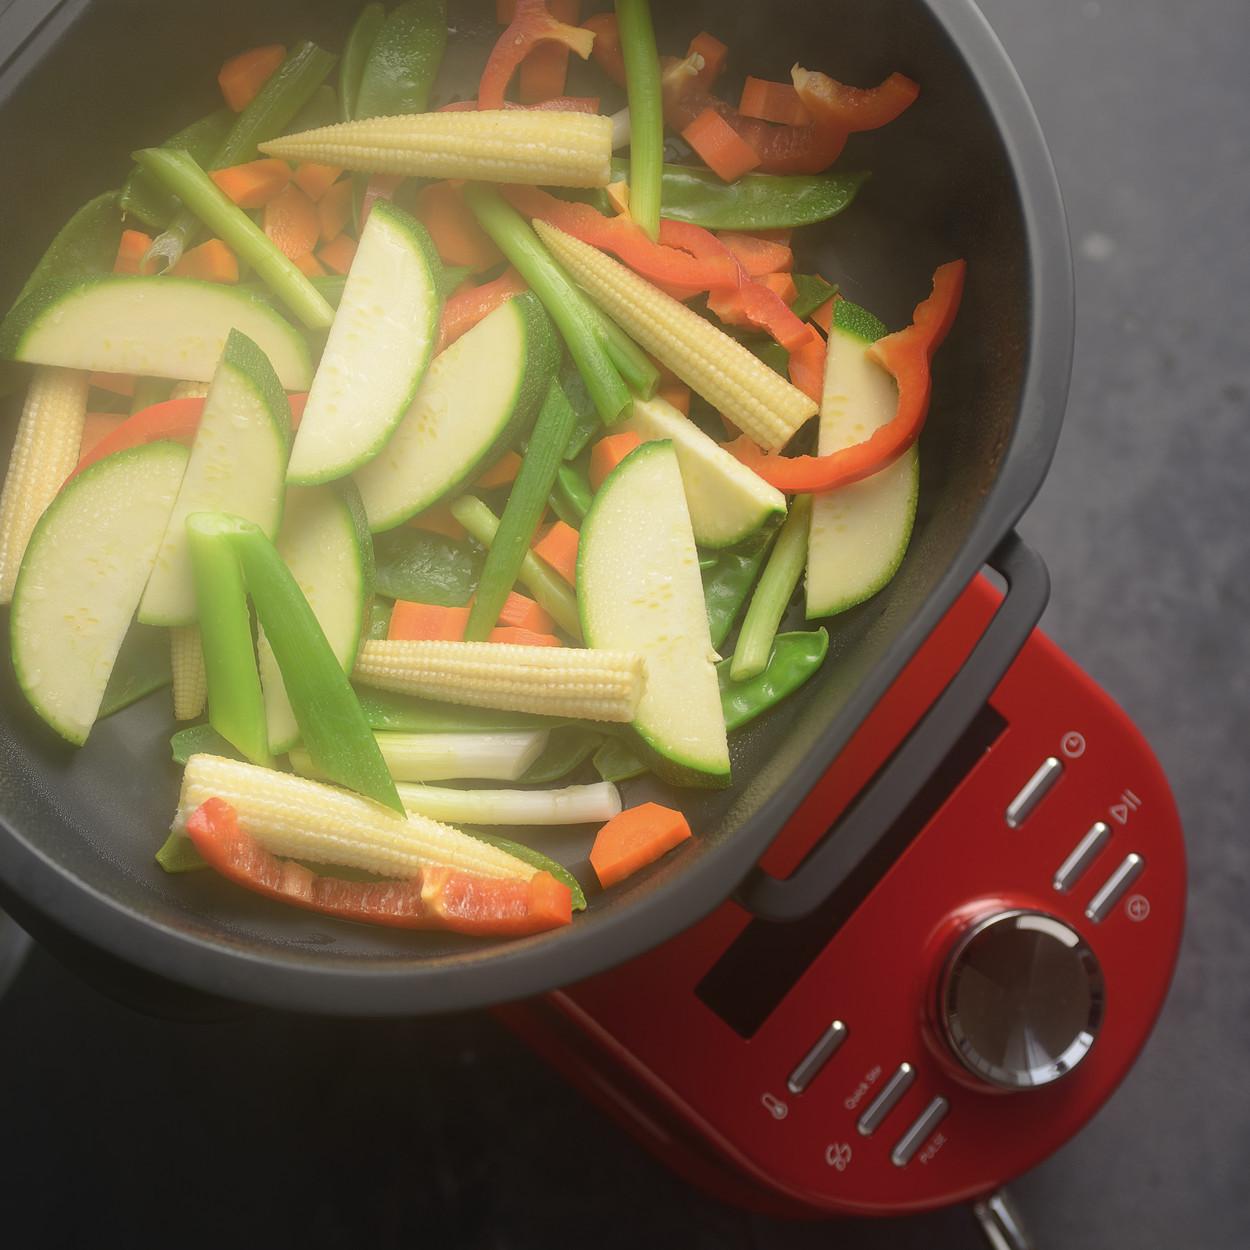 KitchenAid Artisan Cook Processor 5KCF0104ECA/4 - Dünsten